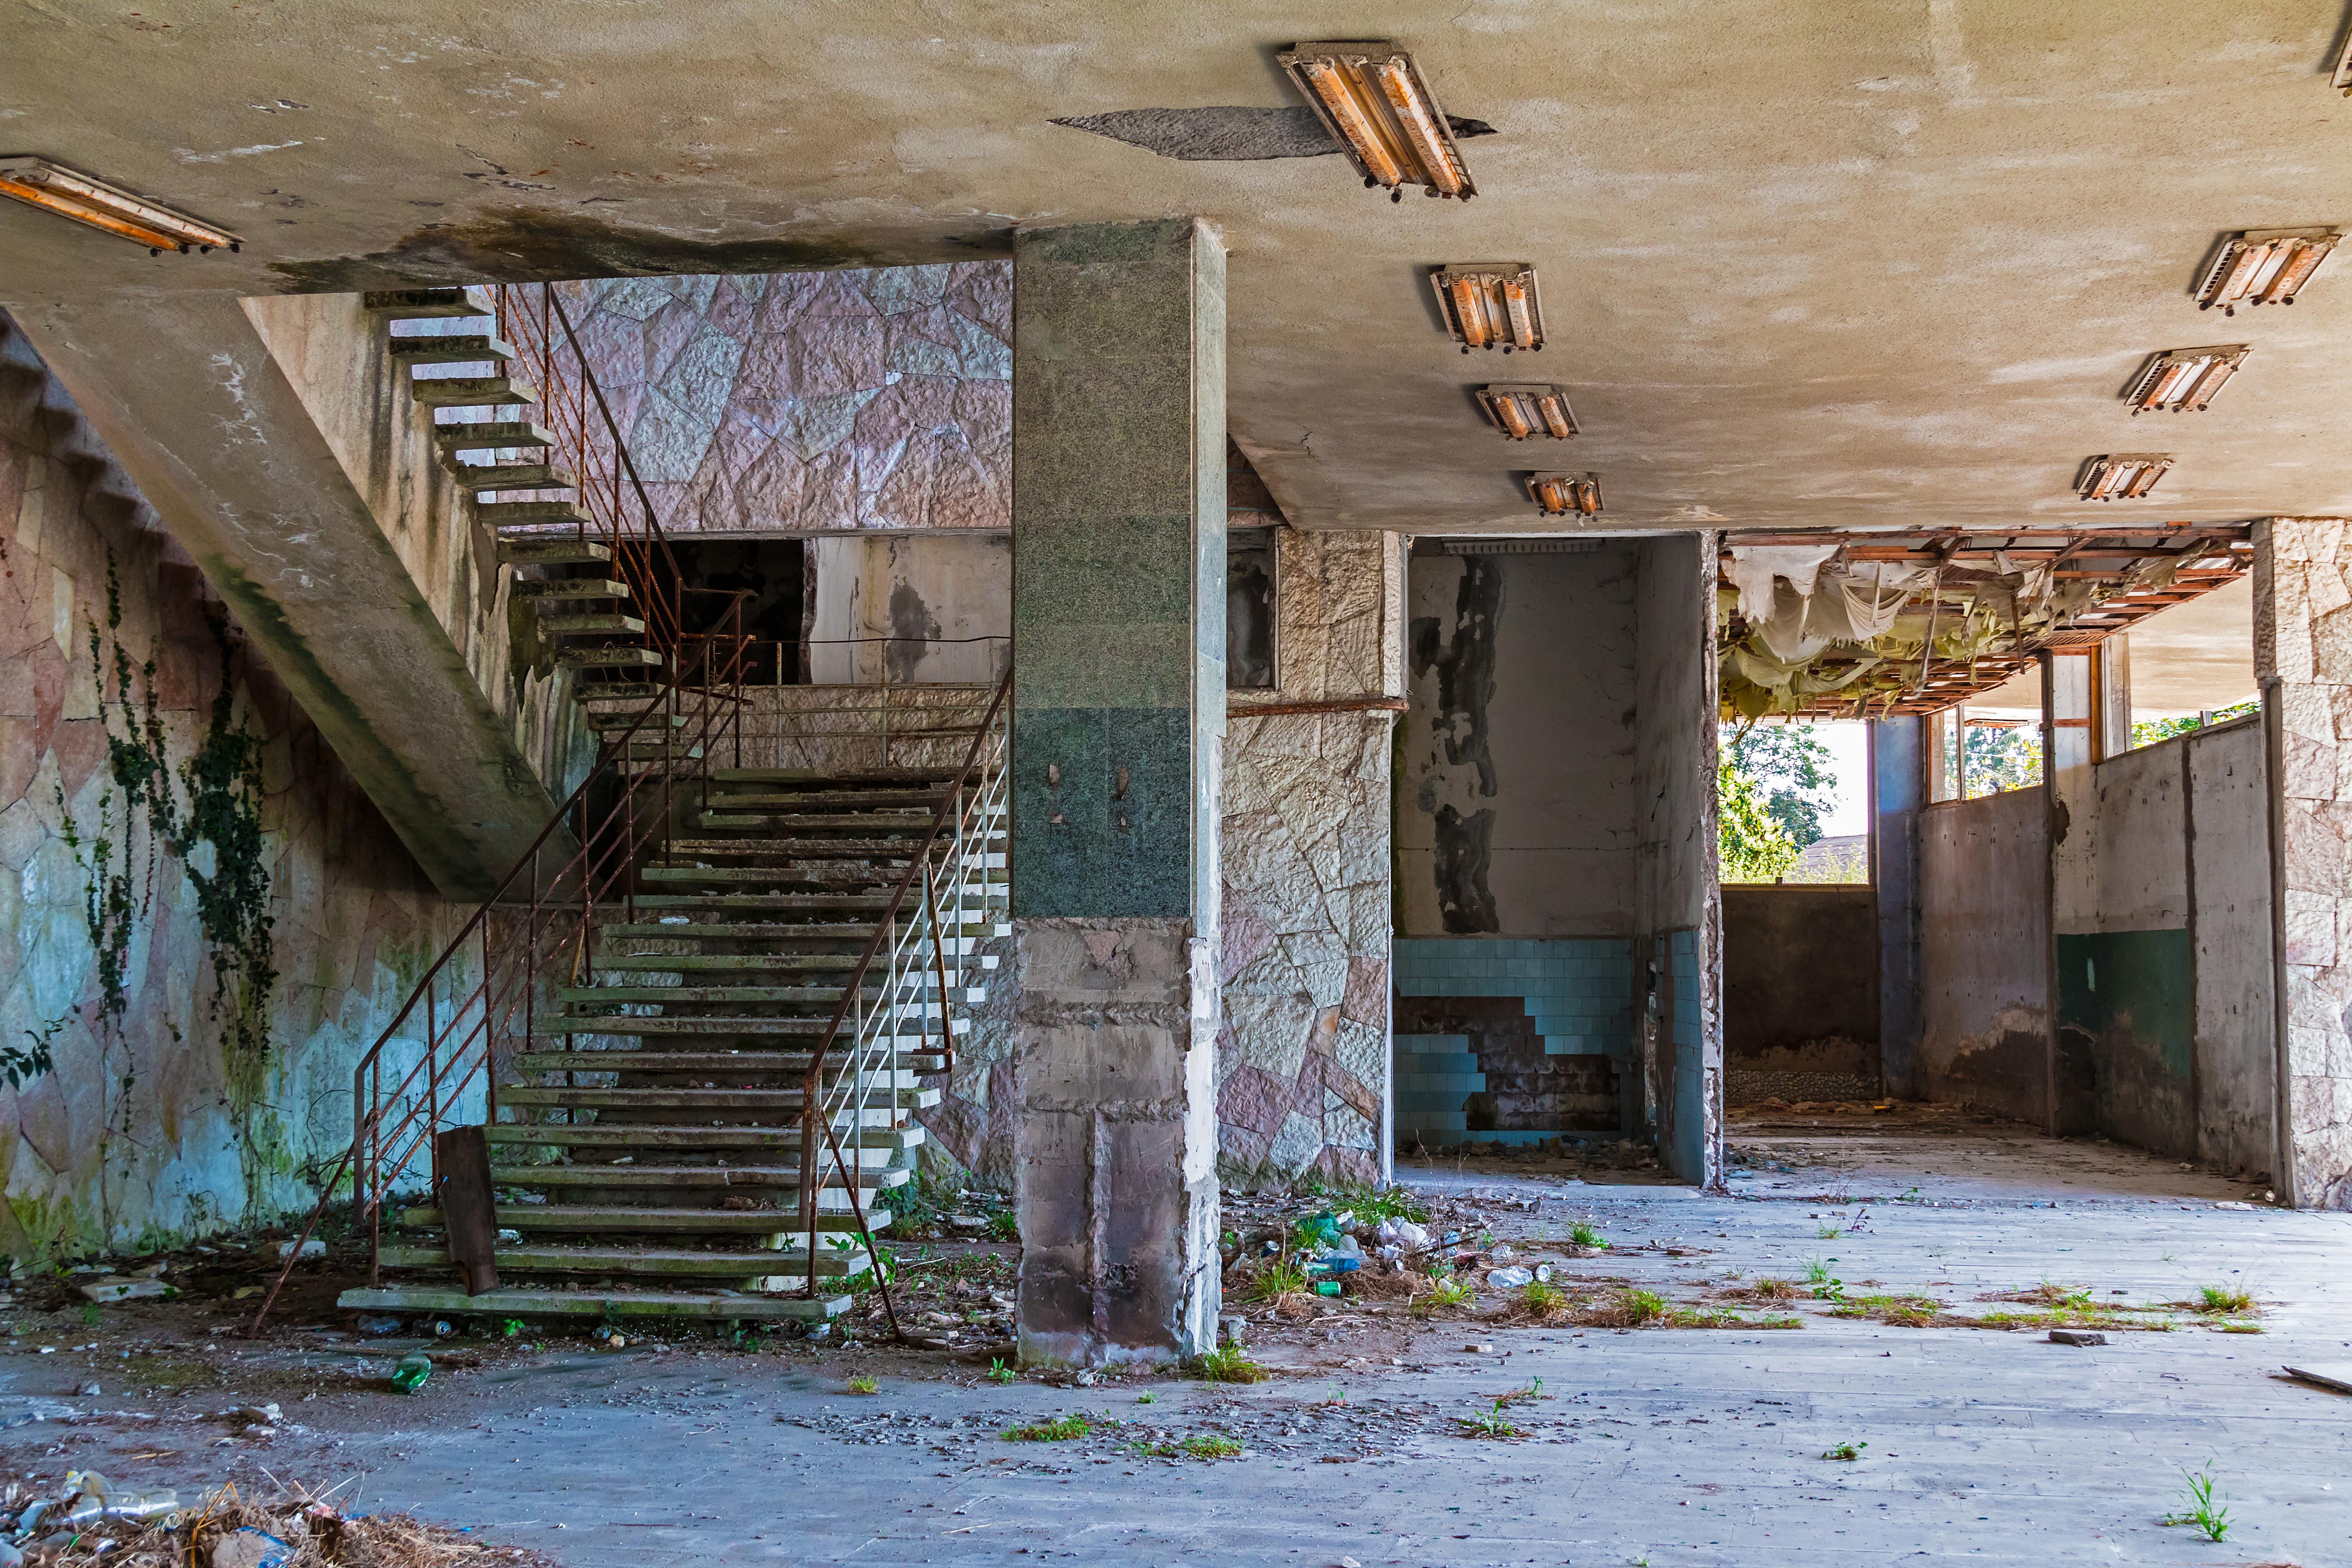 É capaz de visitar estes centros comerciais abandonados?